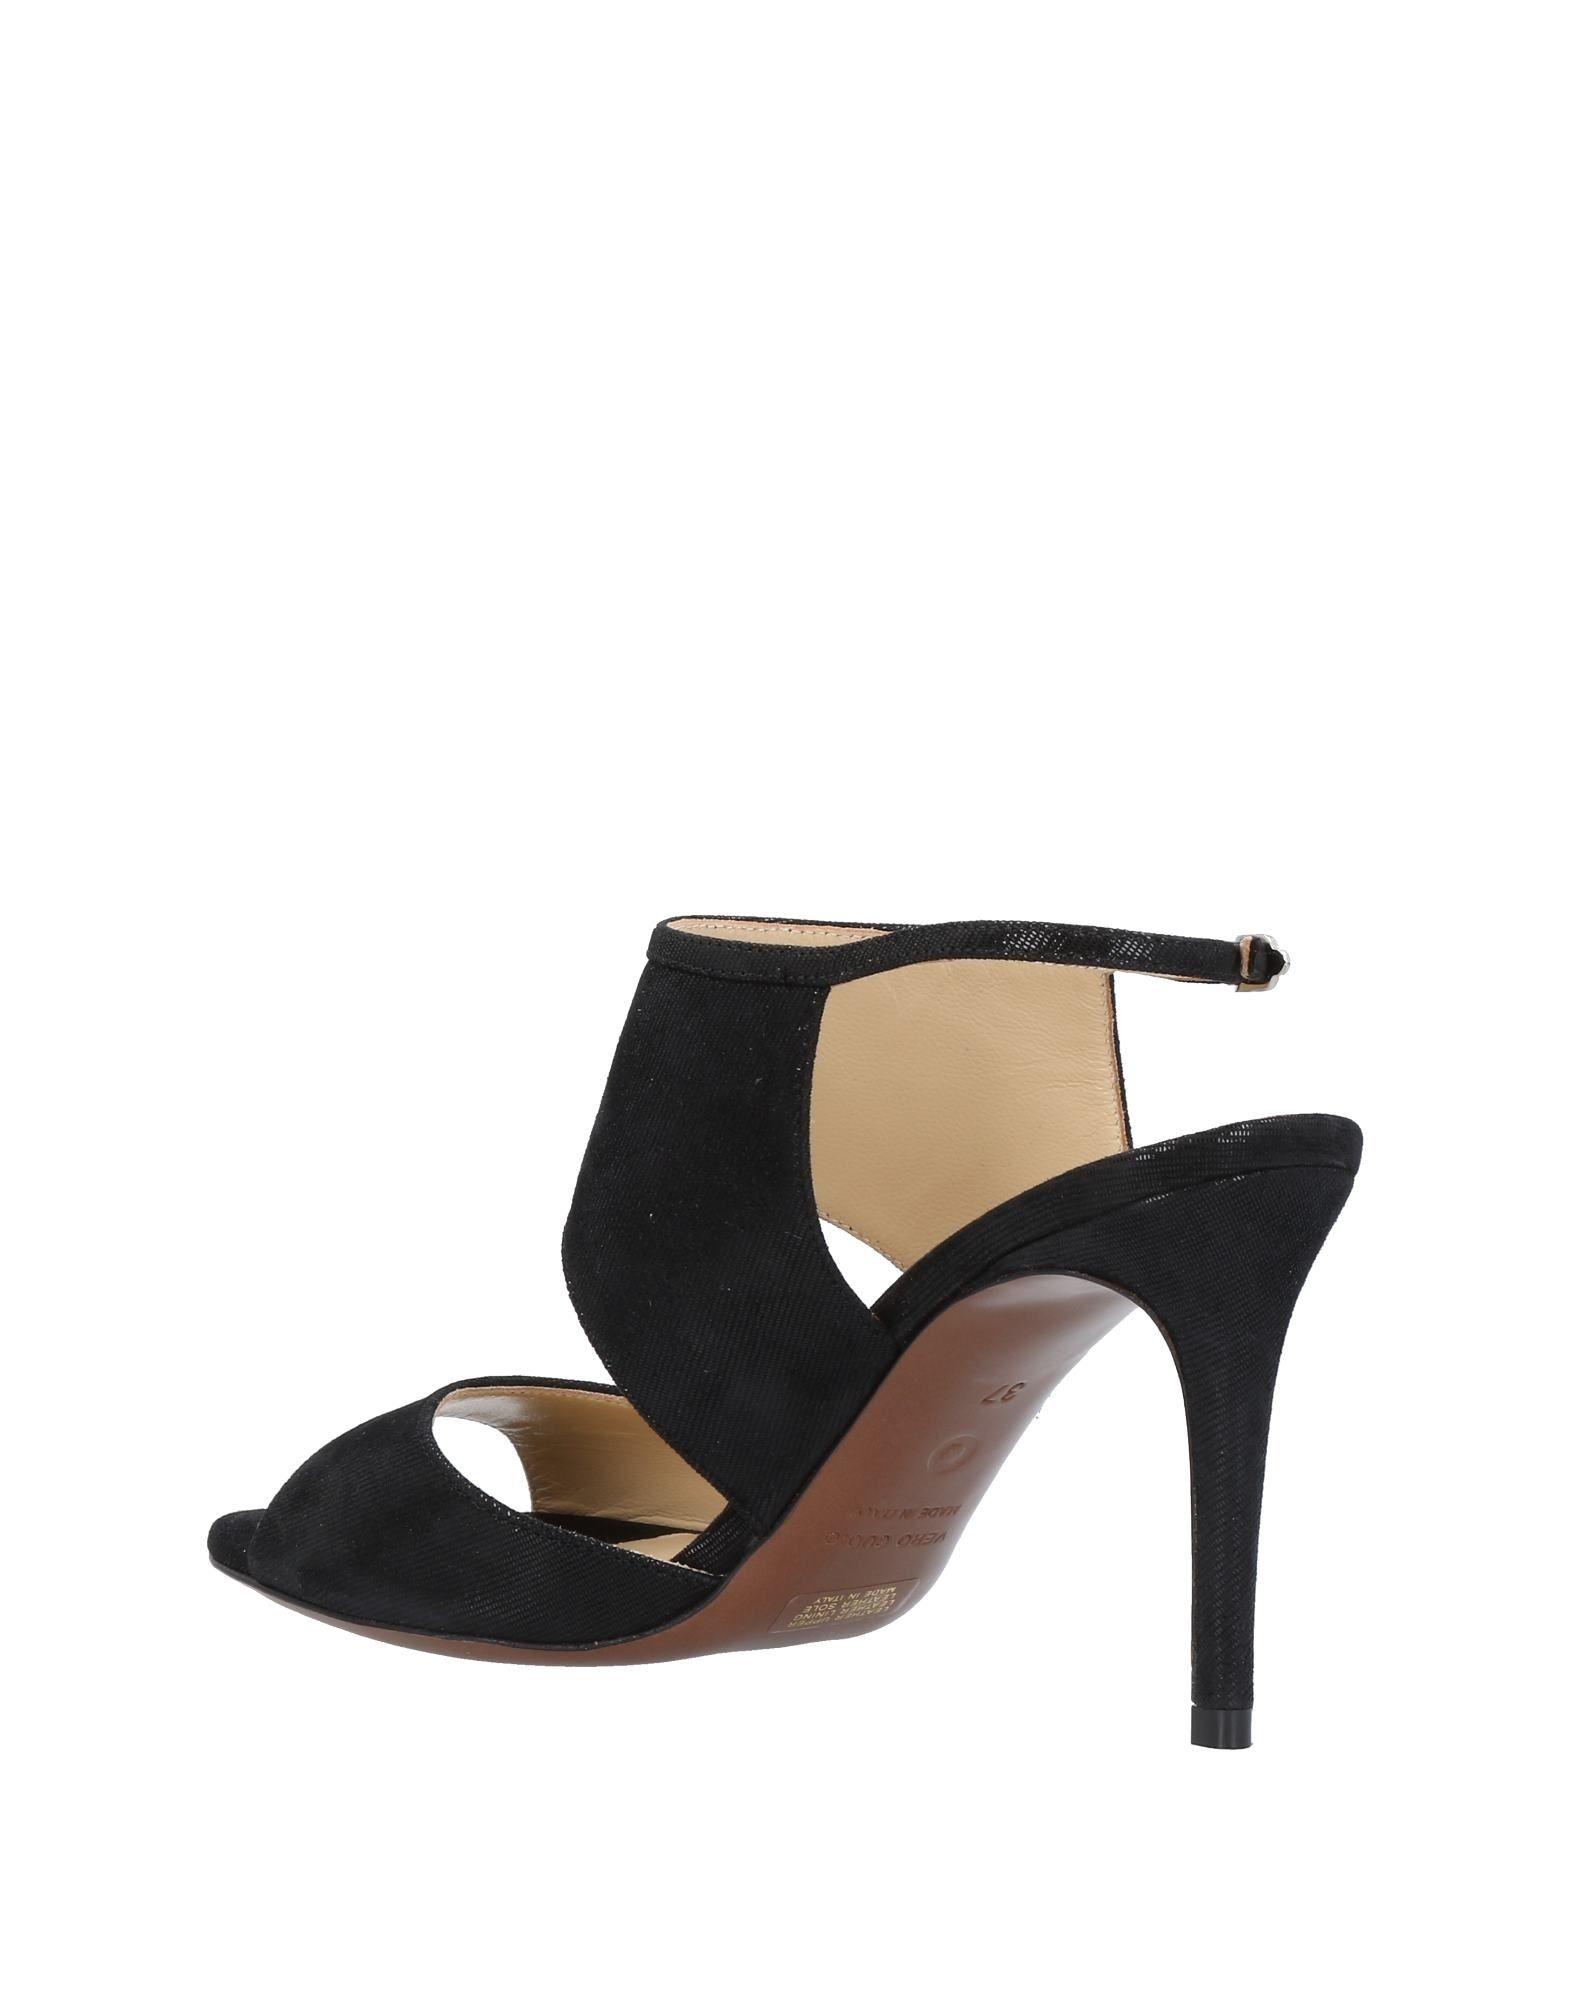 Stilvolle billige Schuhe Damen L' Autre Chose Sandalen Damen Schuhe  11462295RU 17db4b